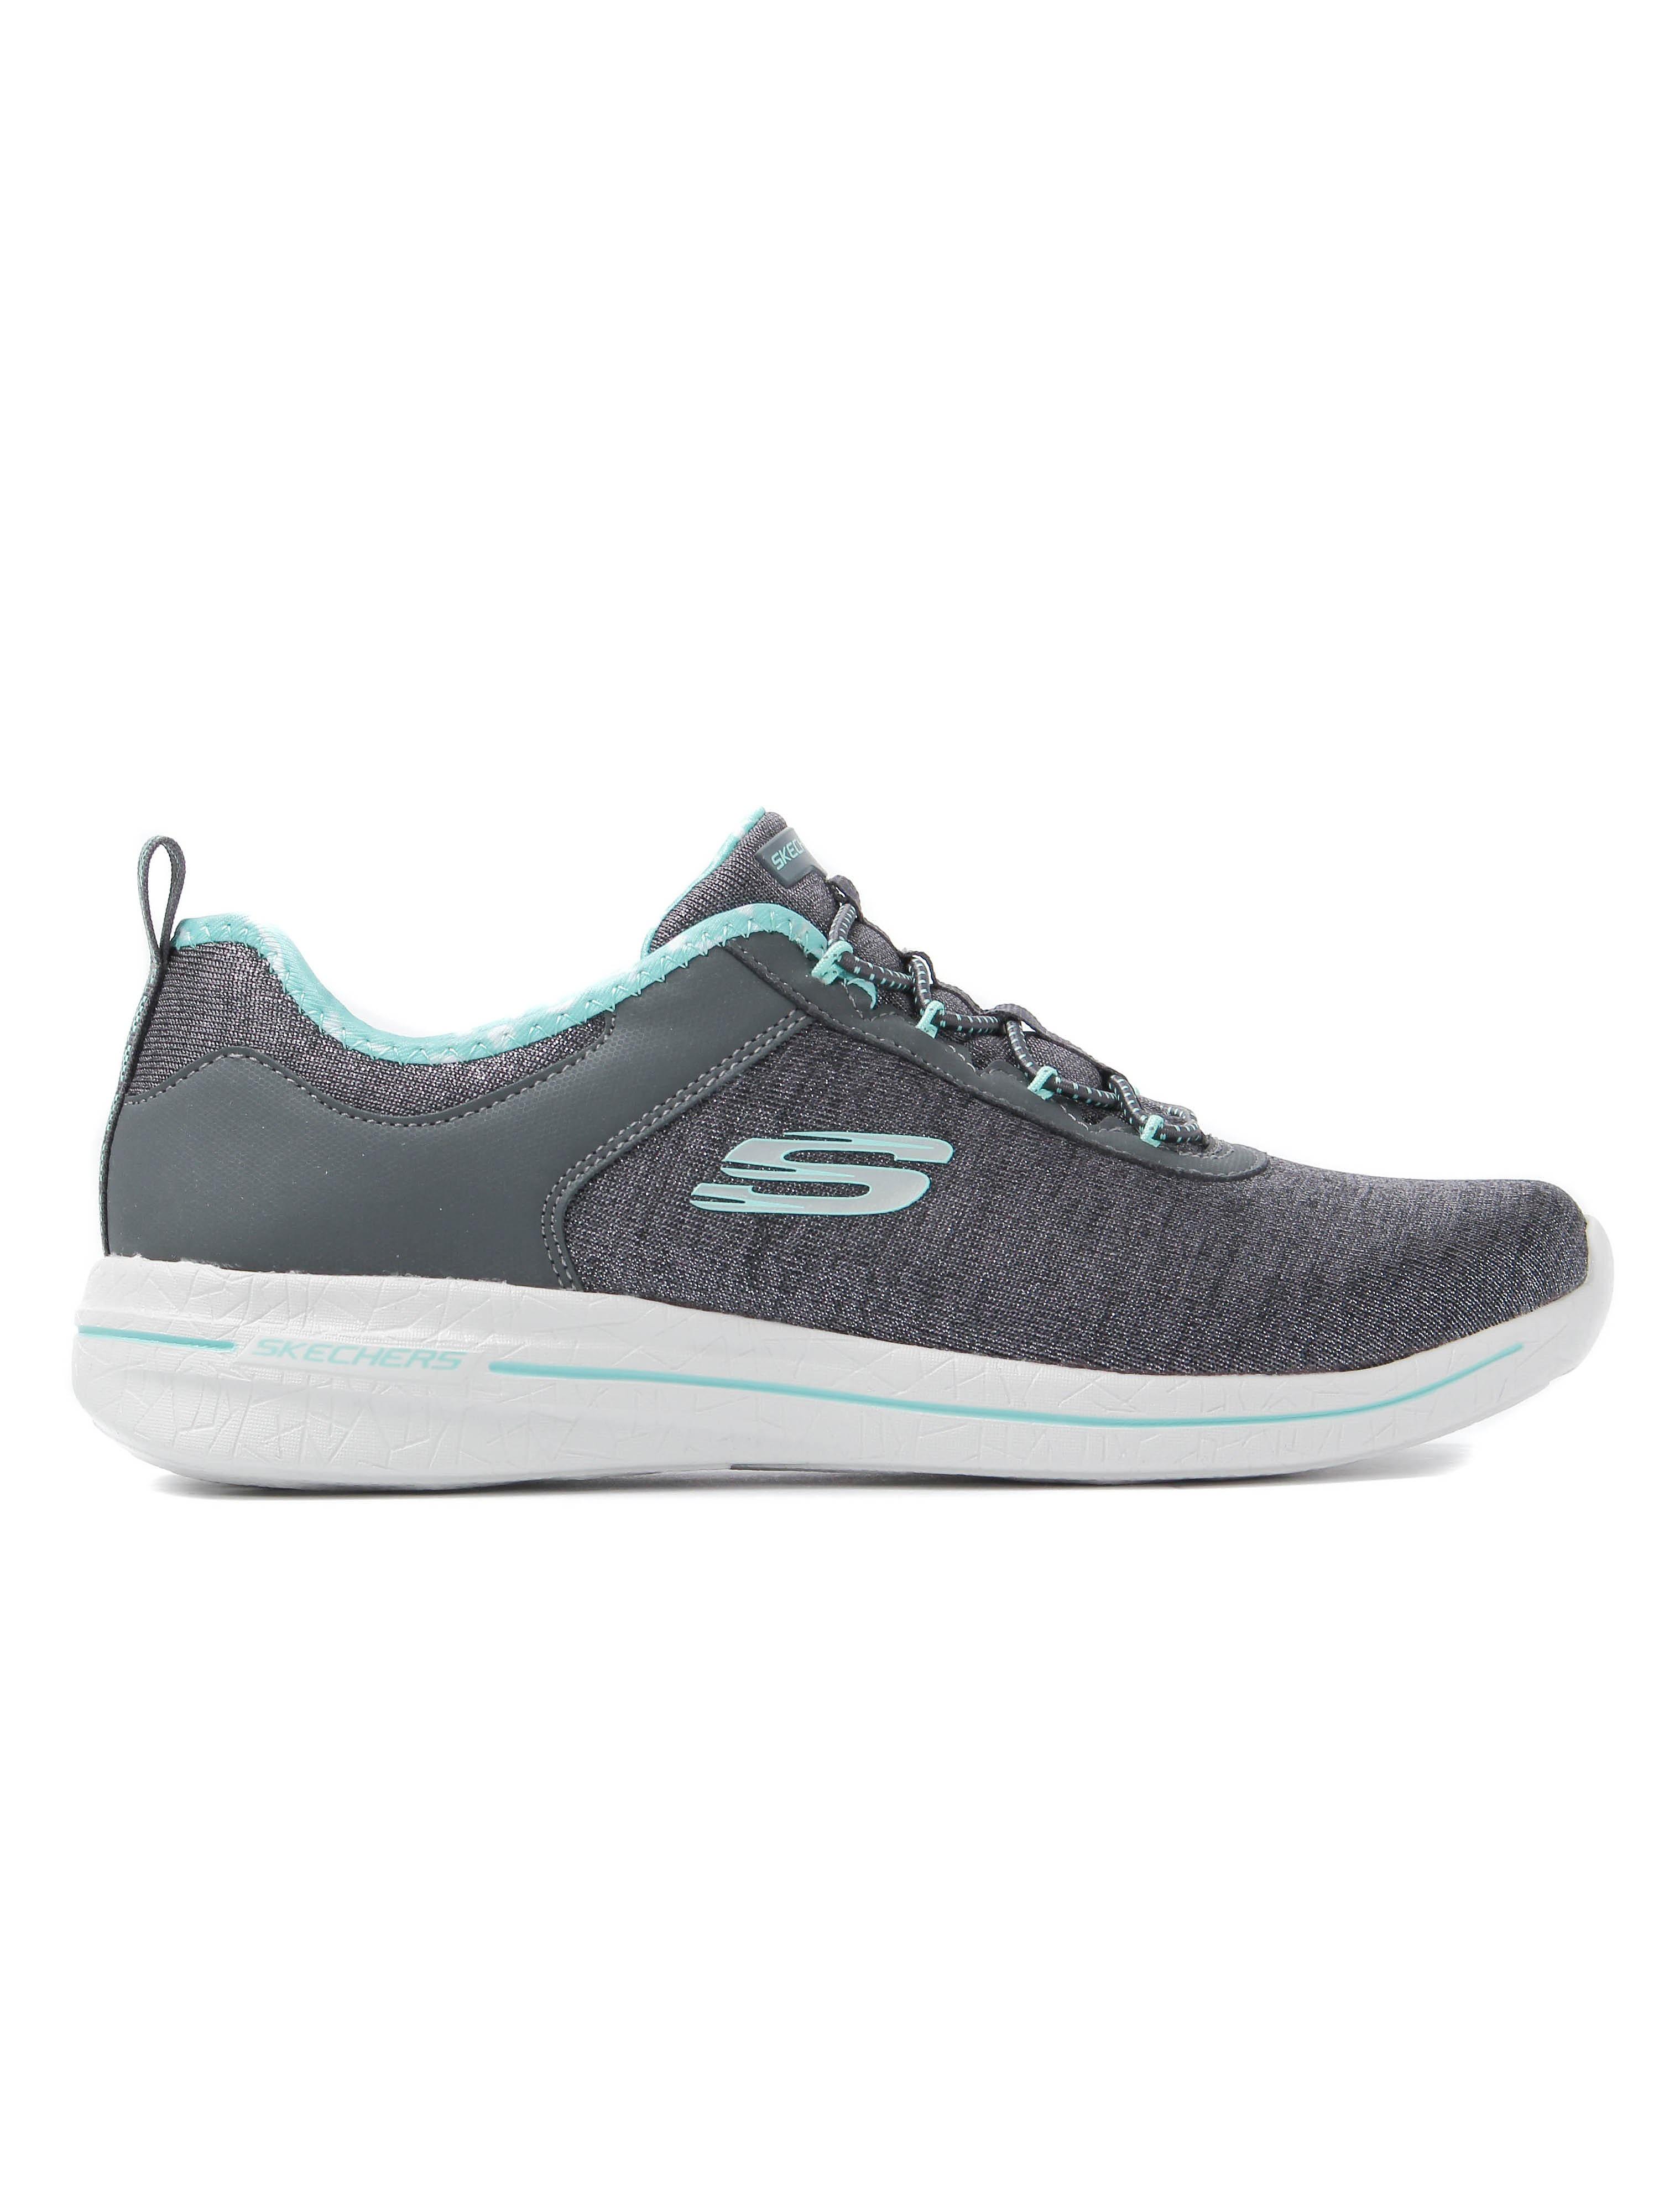 Skechers Women's Burst 2.0 Sunny Side Trainers - Charcoal & Light Blue